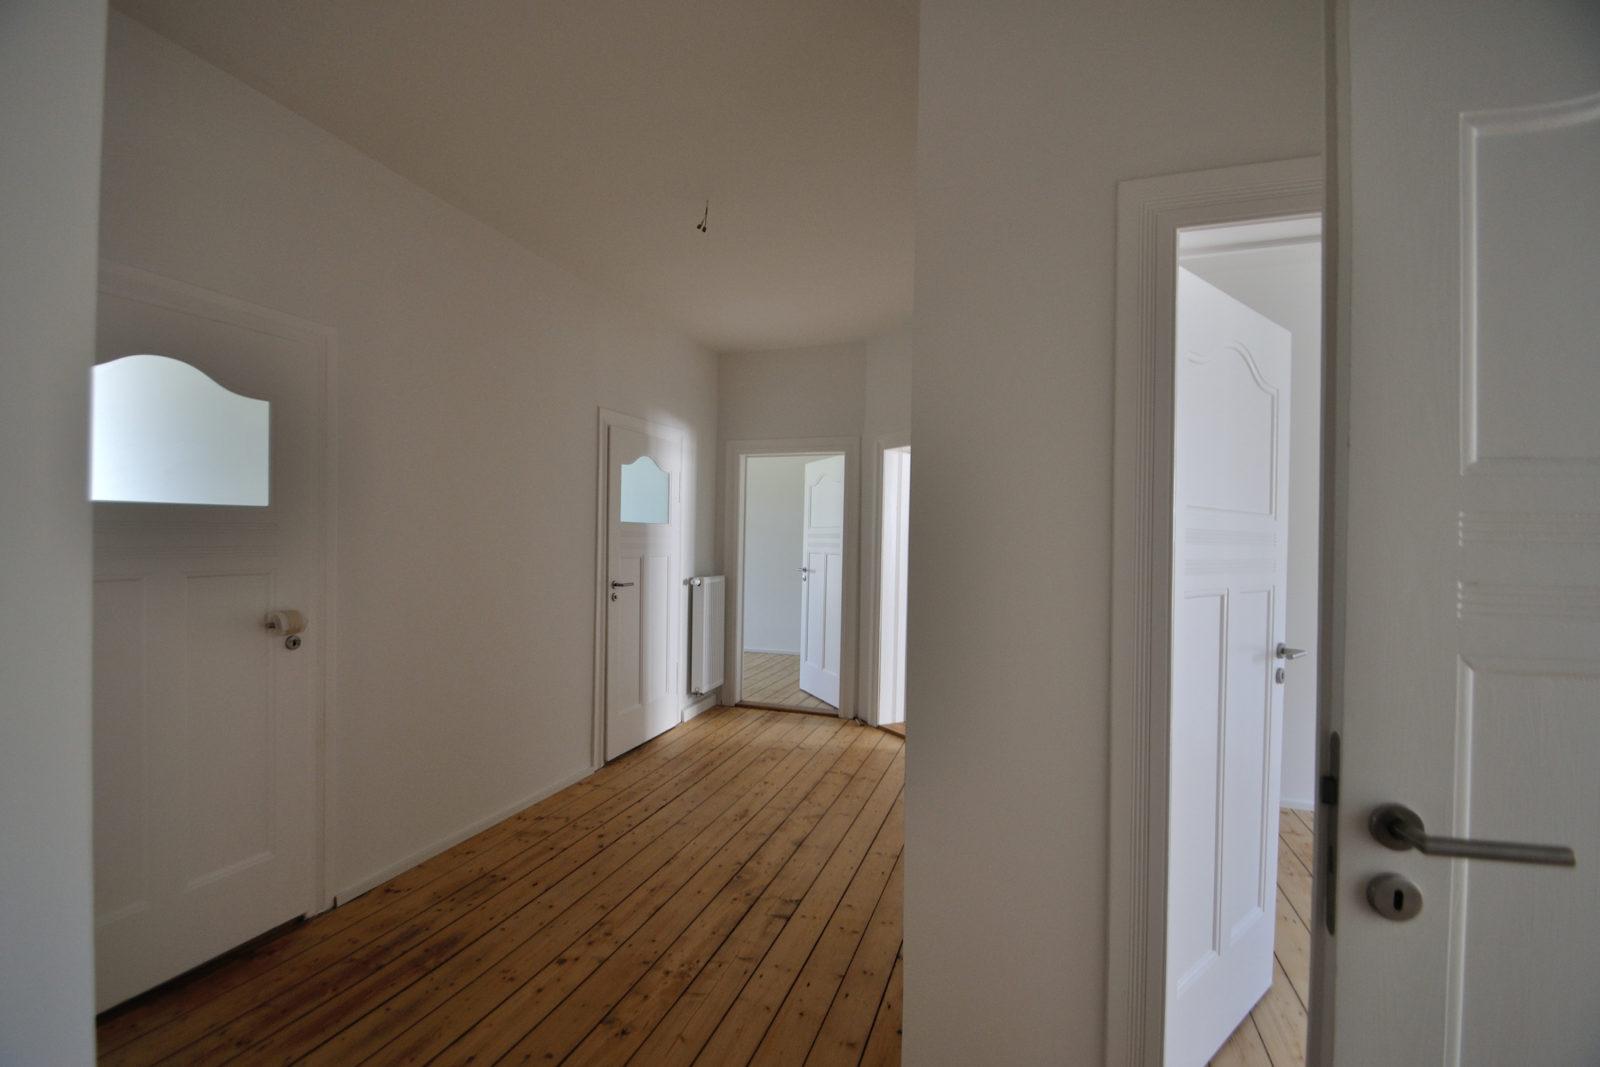 Umbau und Sanierung Mehrfamilienhaus in Leipizg, Plagwitz - Flur